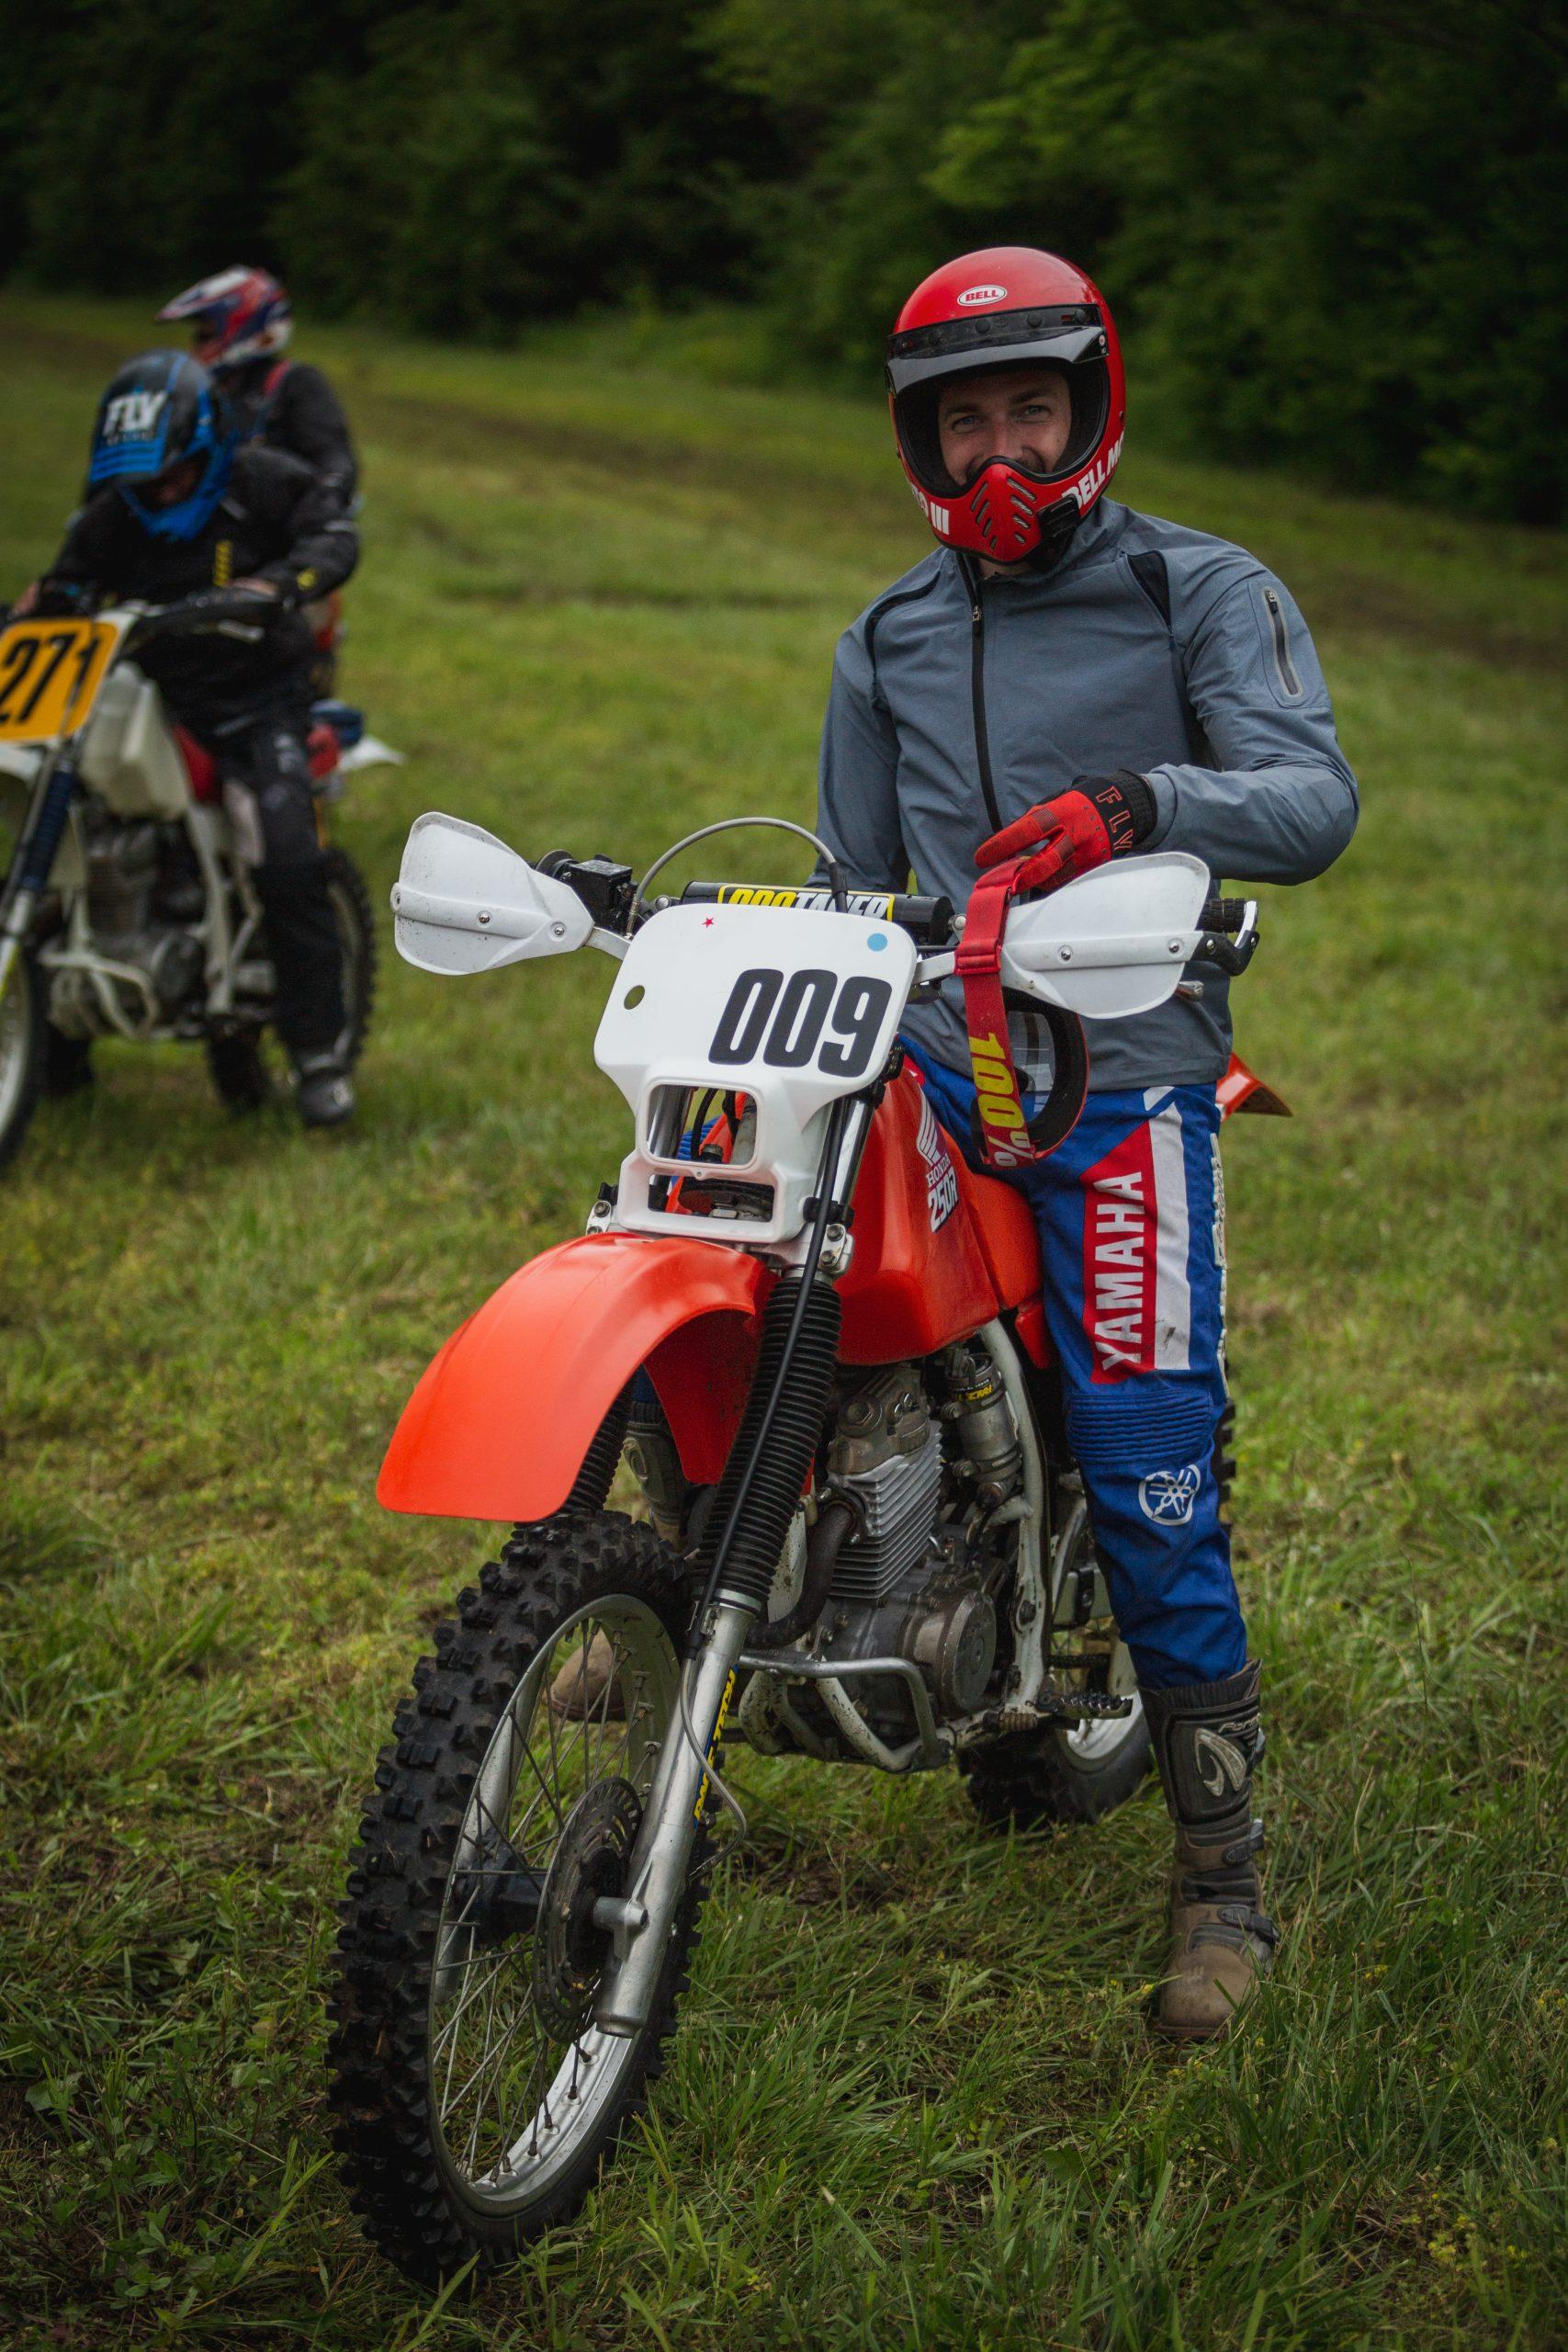 heartland motofest Kyle Smith cross country starting line